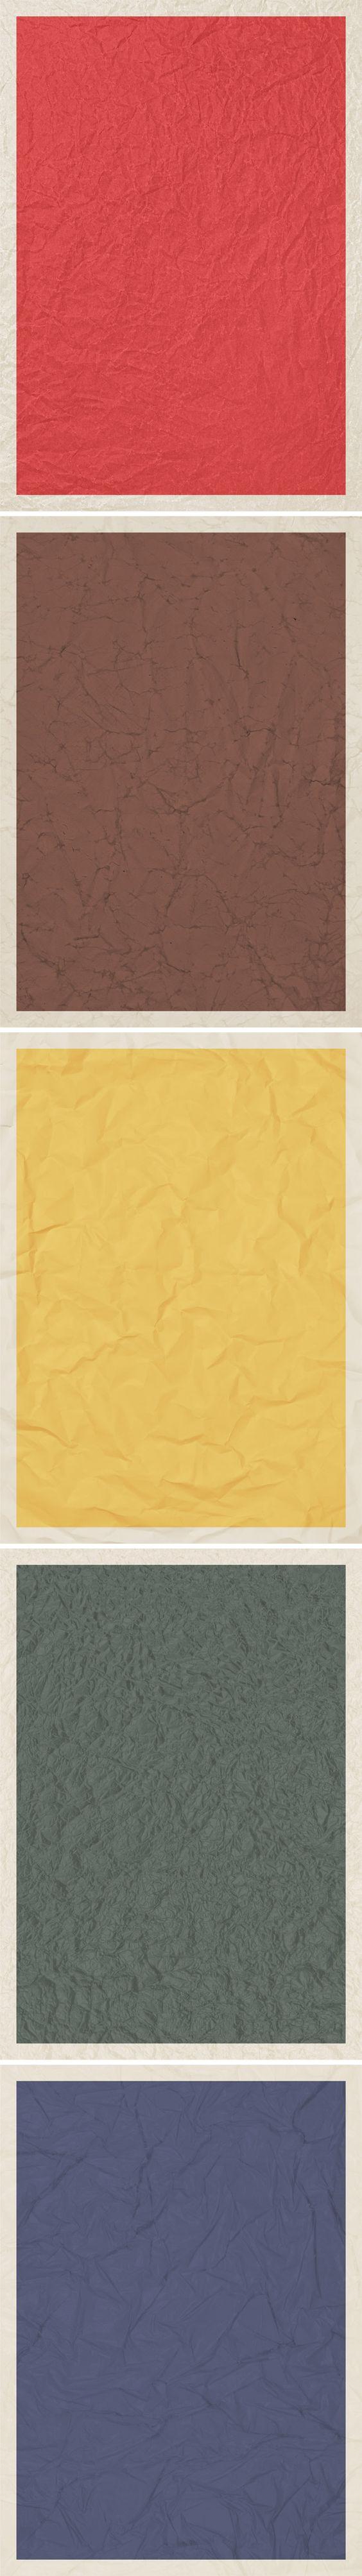 GraphicBurger » 5 Wrinkled Poster Backgrounds